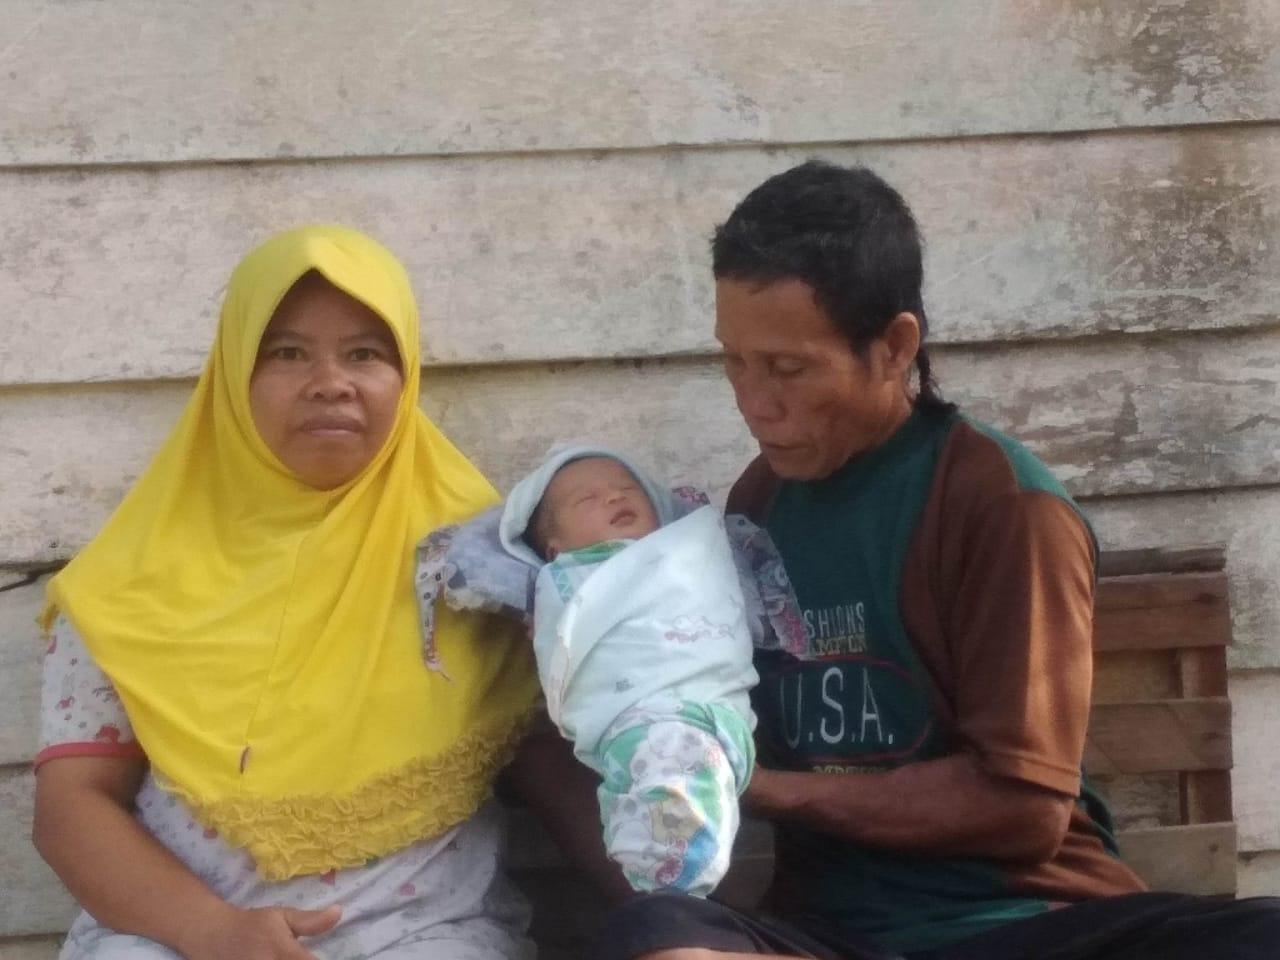 Dukung Andi Putra-Suhardiman, Warga Marsawa Sentajo Raya Beri Nama Bayi Asa